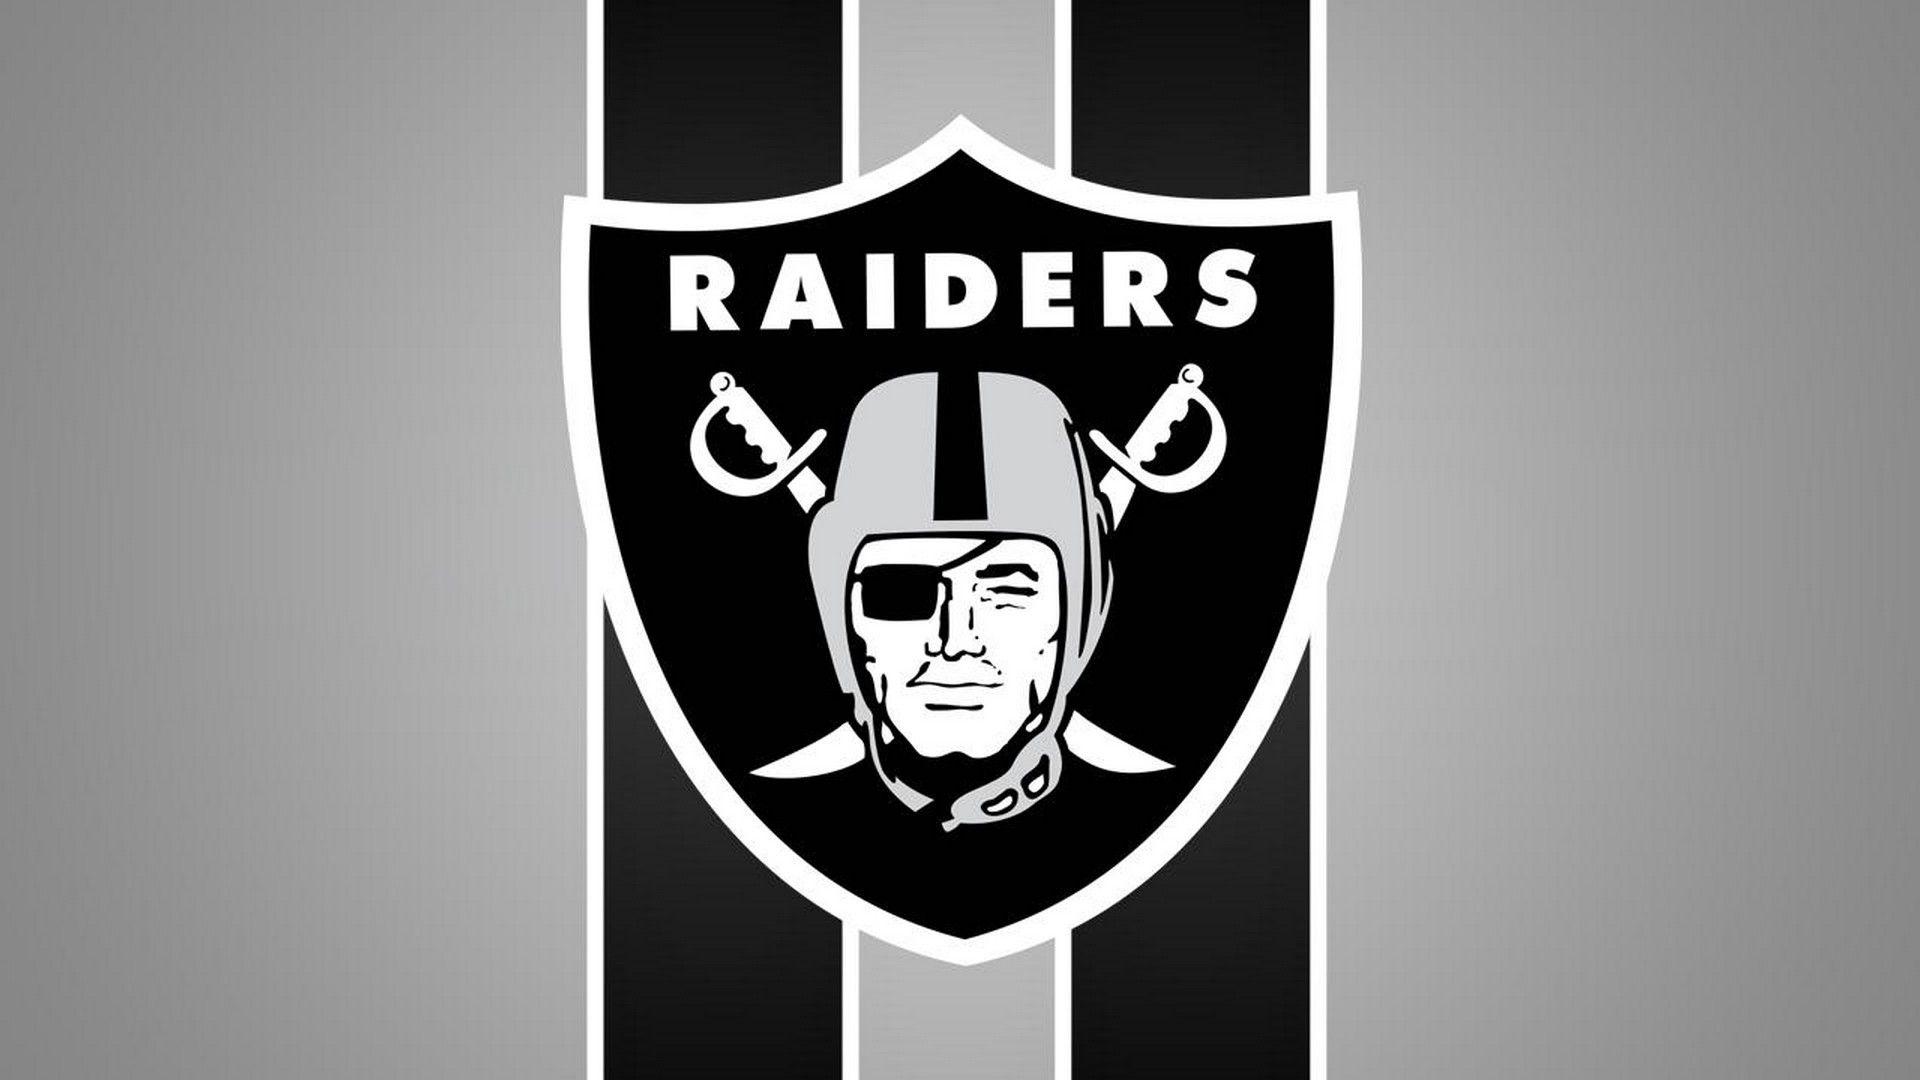 Oakland Raiders Backgrounds HD Nfl football wallpaper